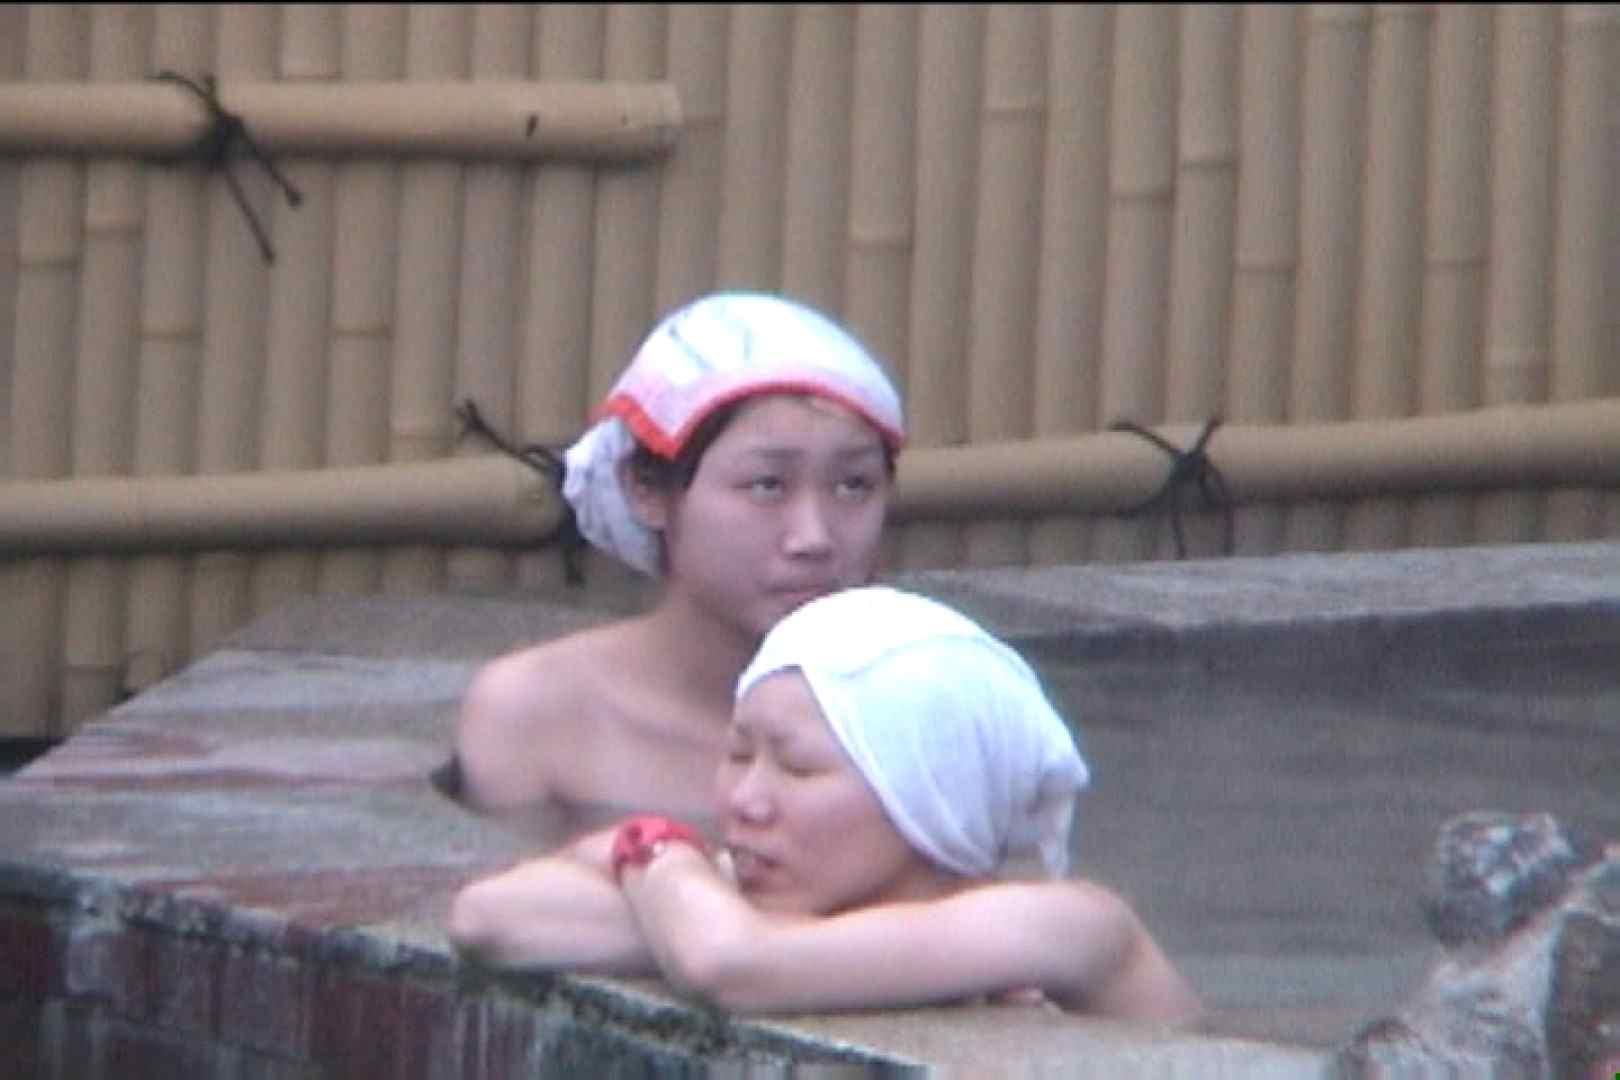 Aquaな露天風呂Vol.91【VIP限定】 盗撮シリーズ | 露天風呂編  99PIX 39